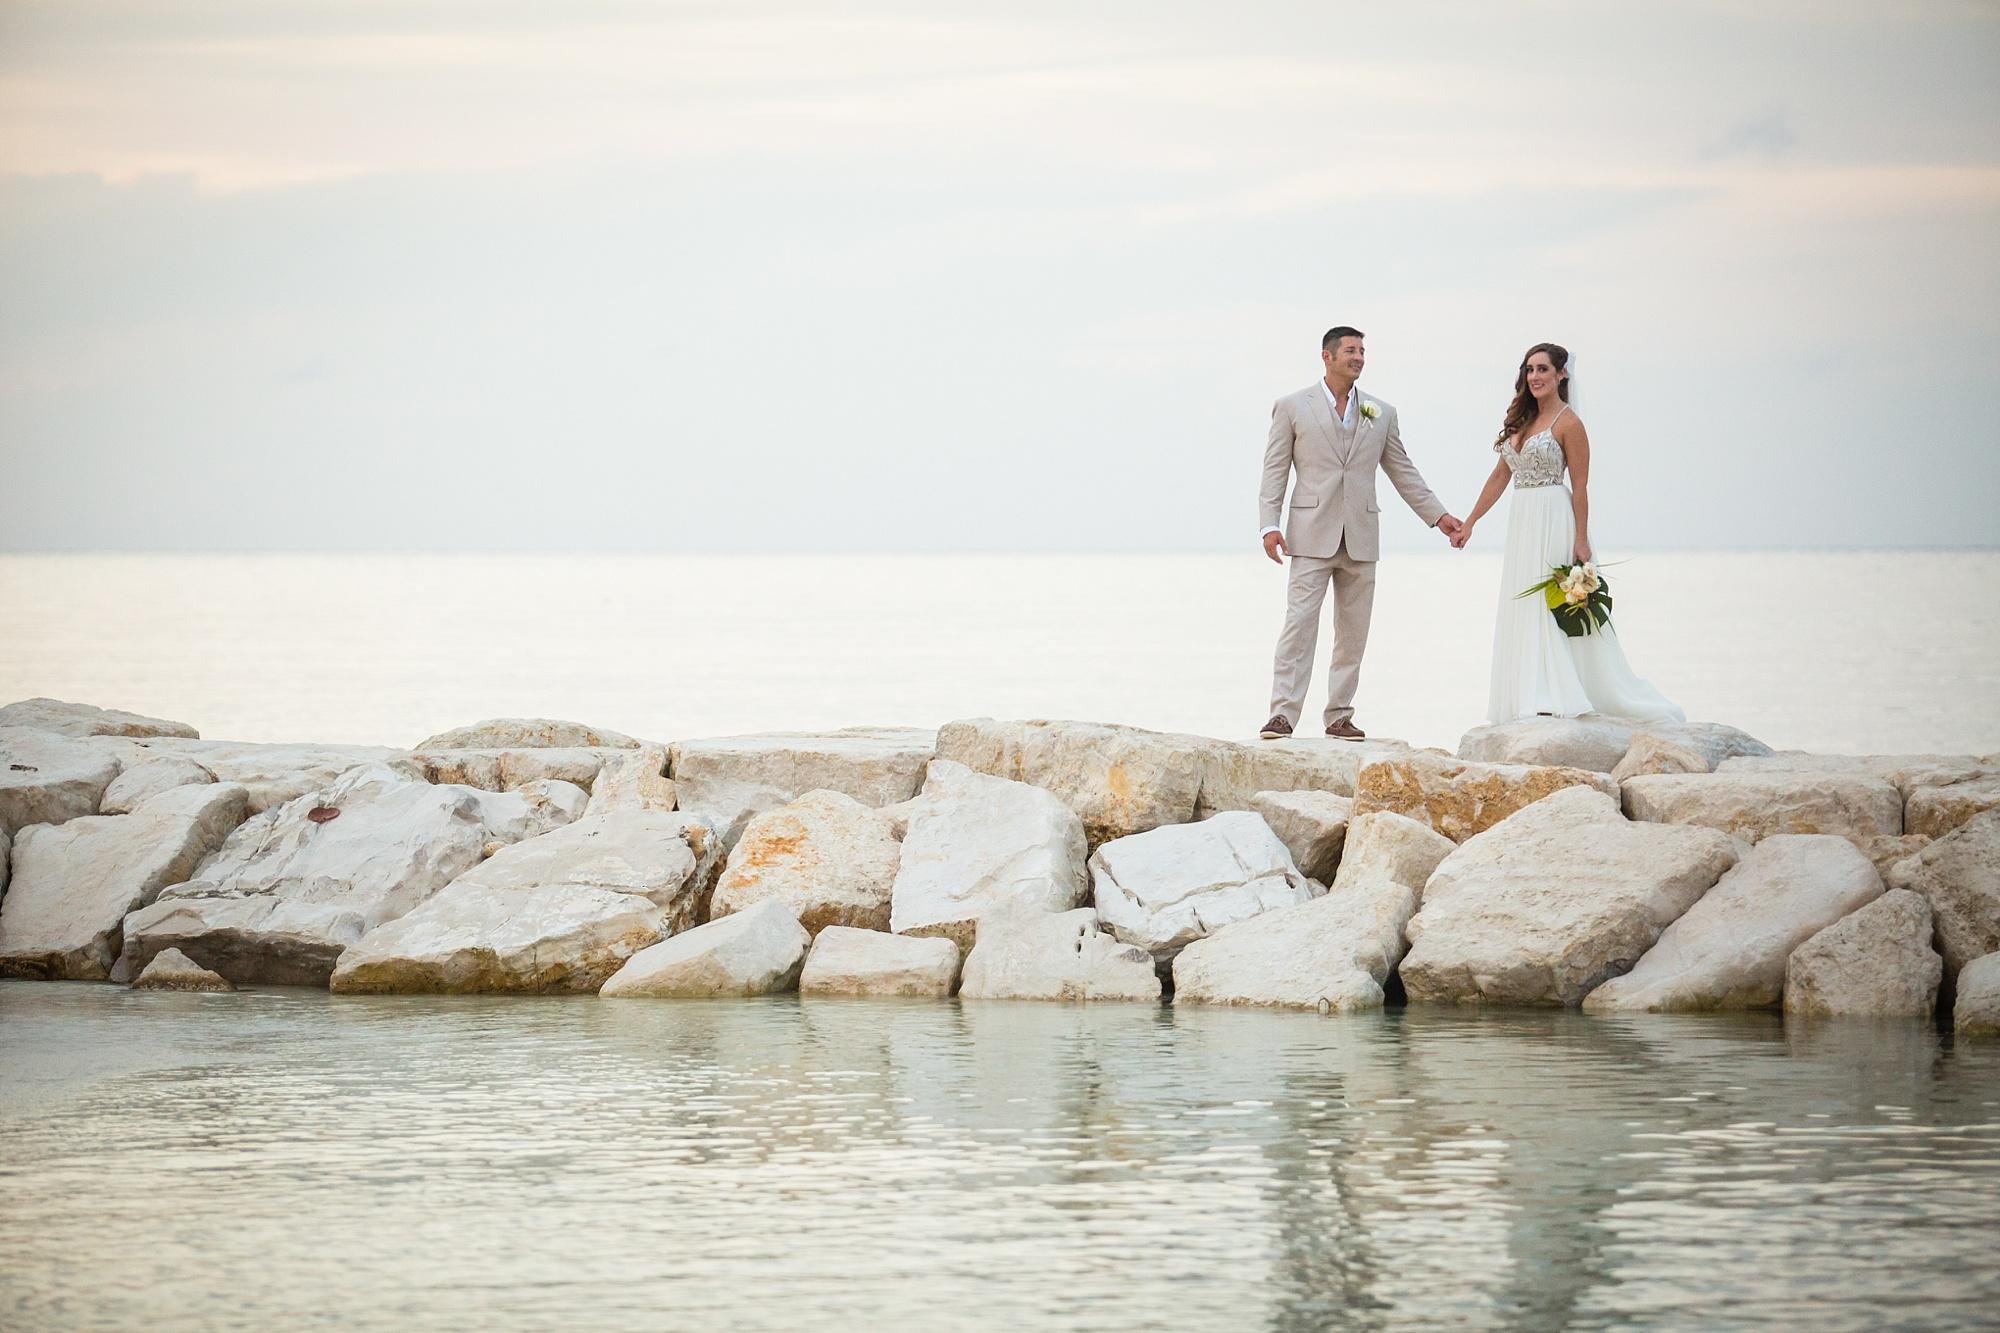 Brandon_Shafer_Photography_Scott_Marisa_Negril_Jamaica_Destination_Wedding_Photography_0056.jpg